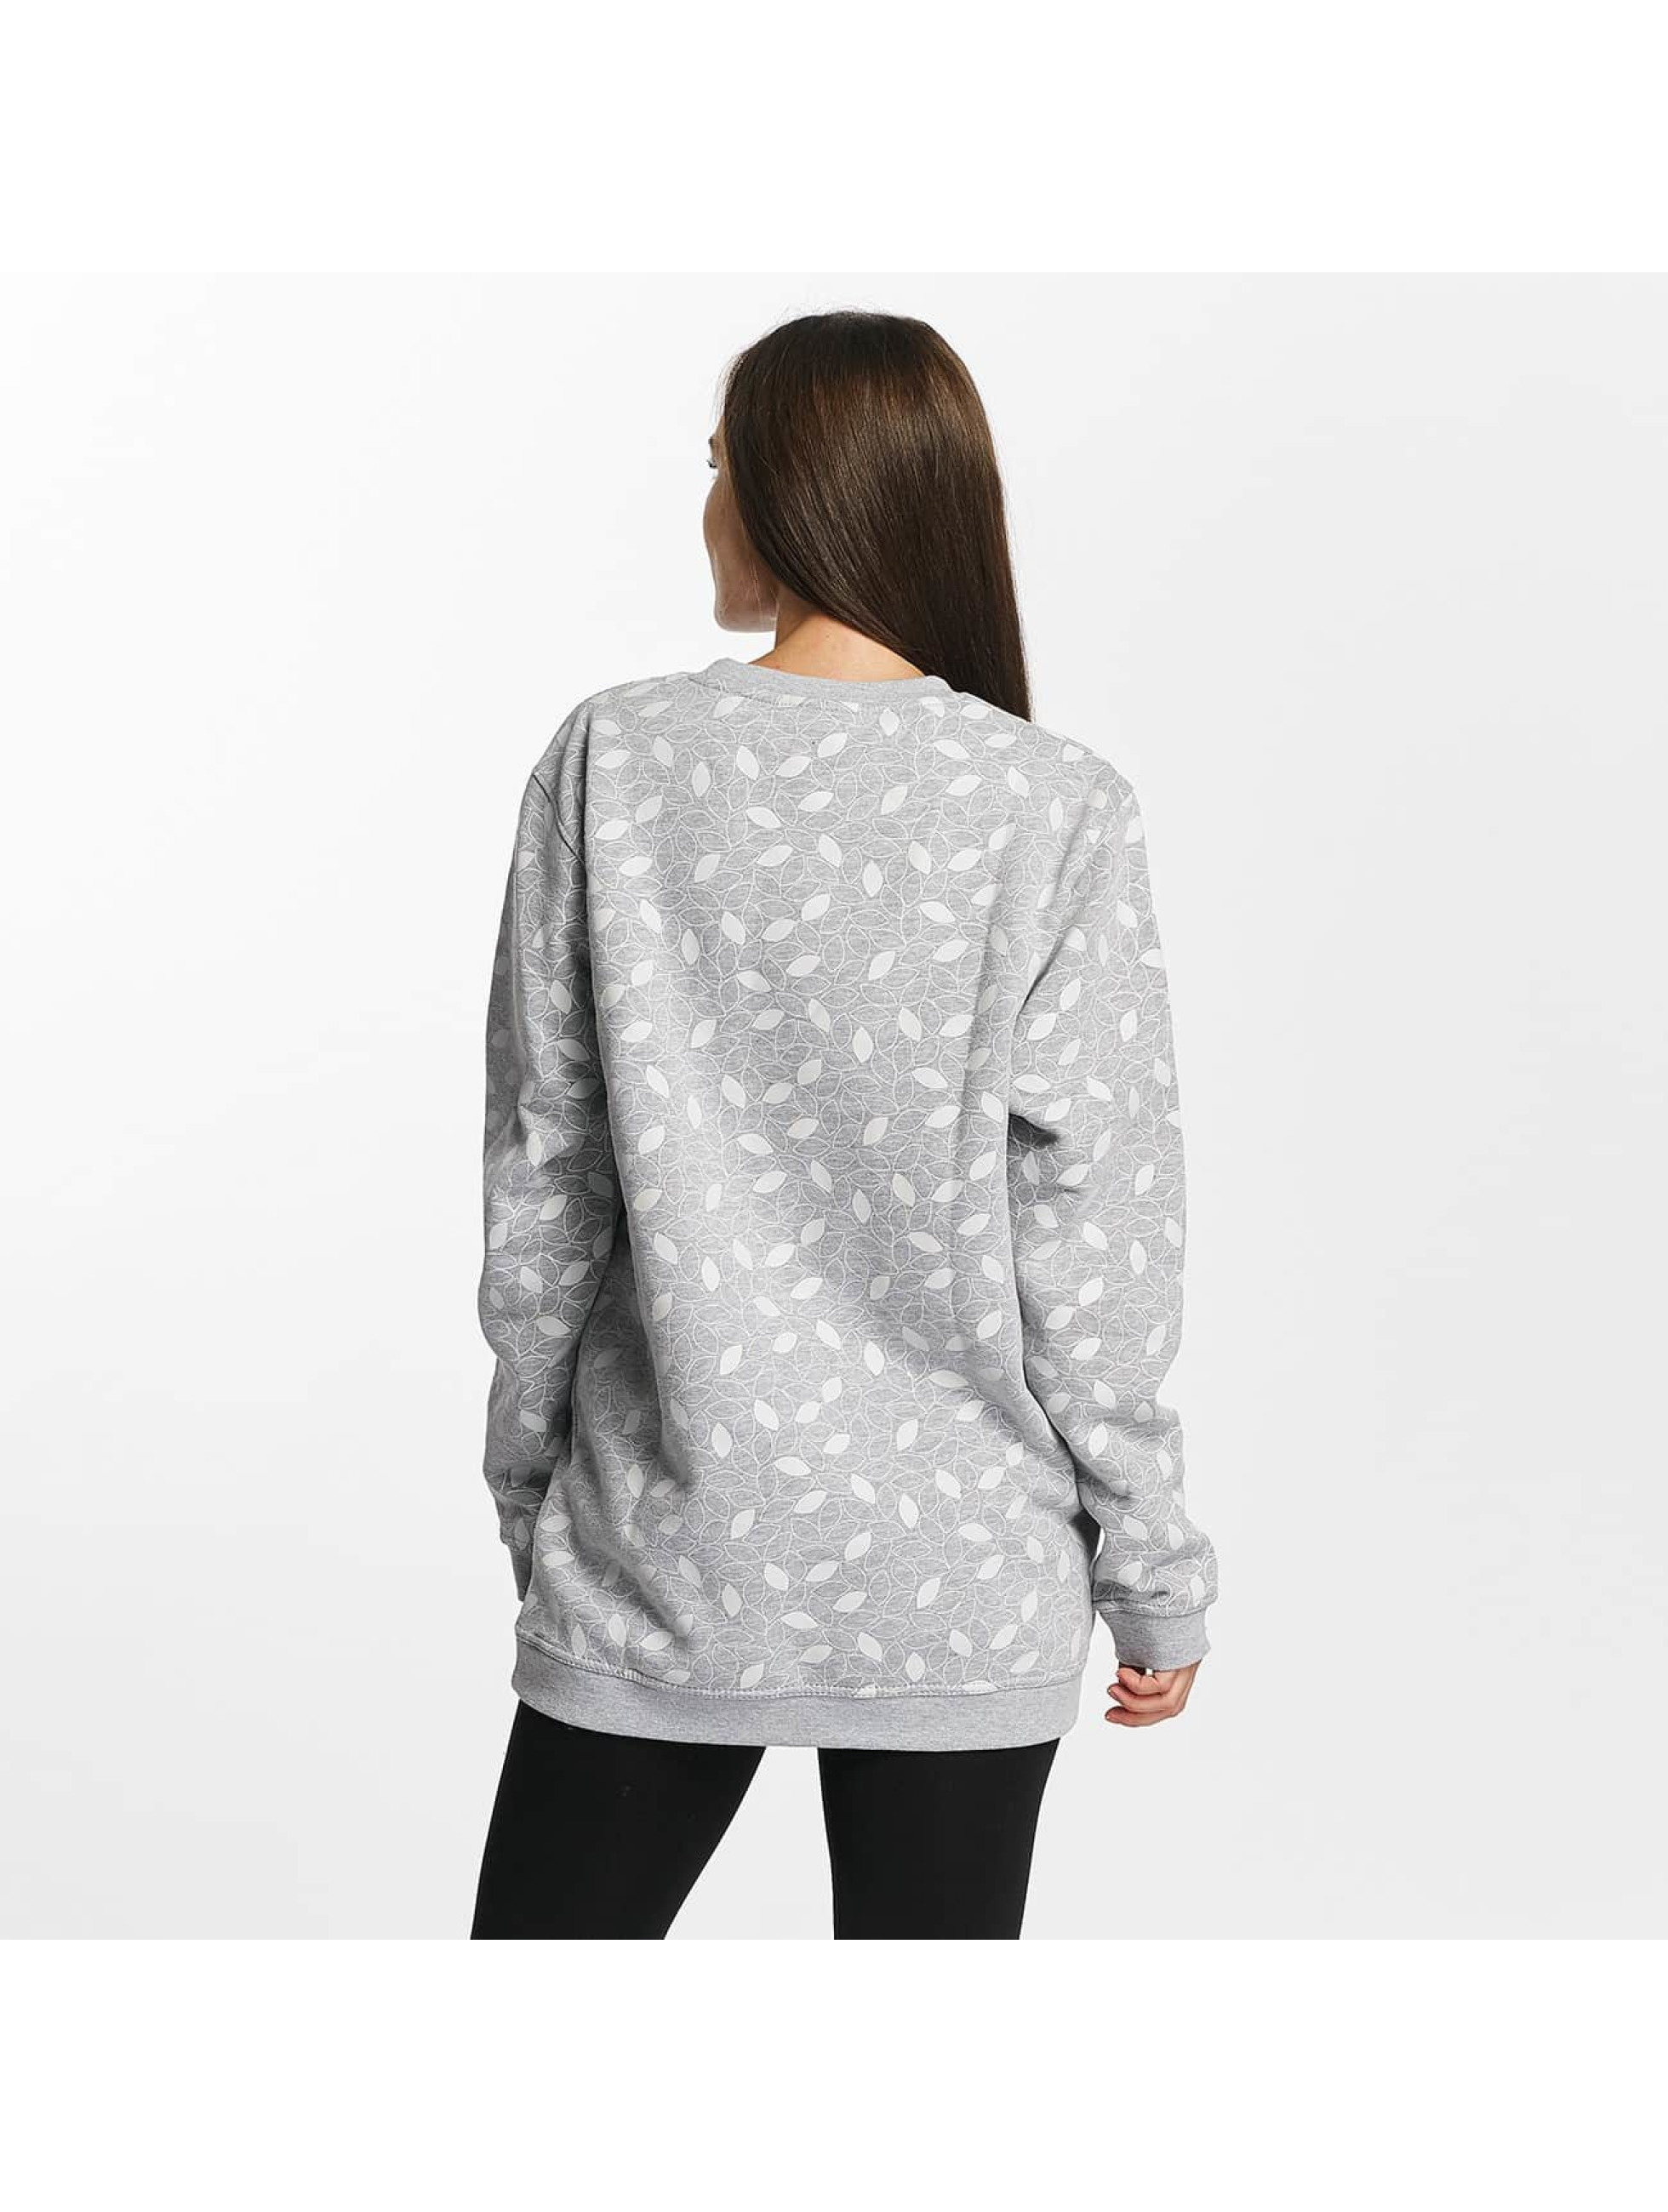 Cyprime Пуловер Tantalum Oversized серый